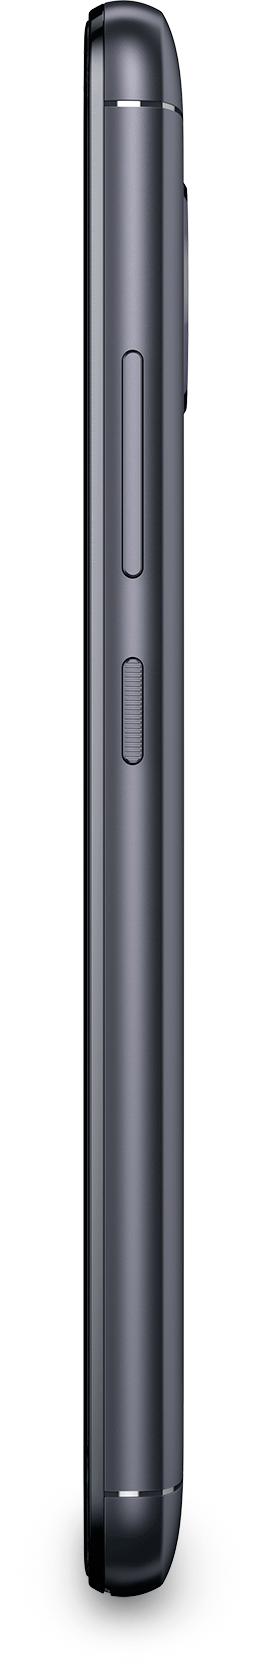 metallic iron gray